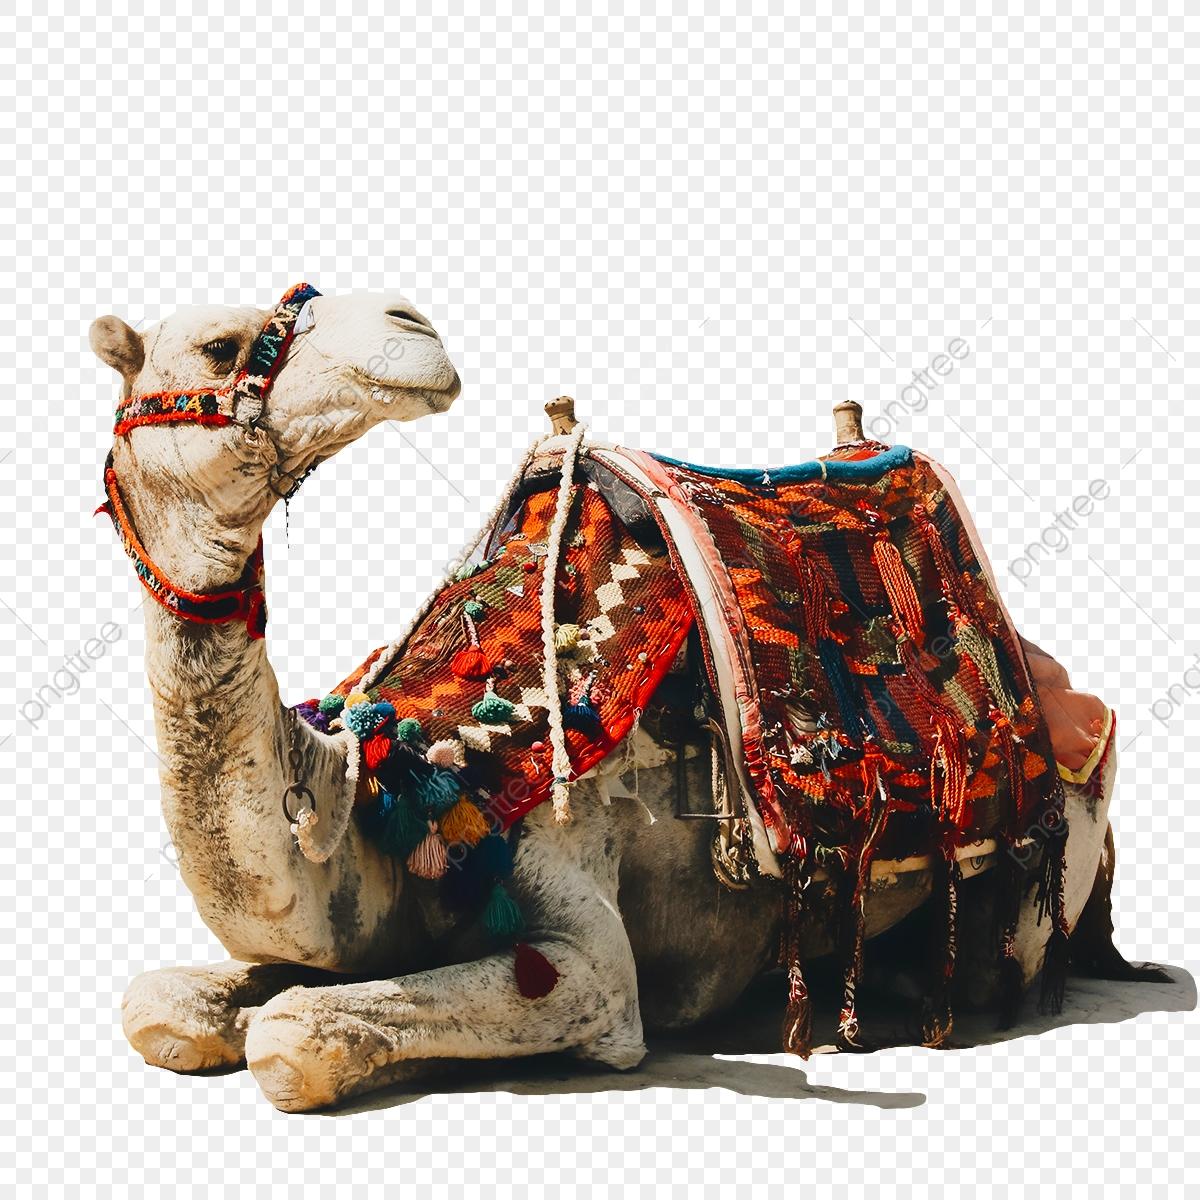 Camel clipart camel egypt. Png cartoon egyption